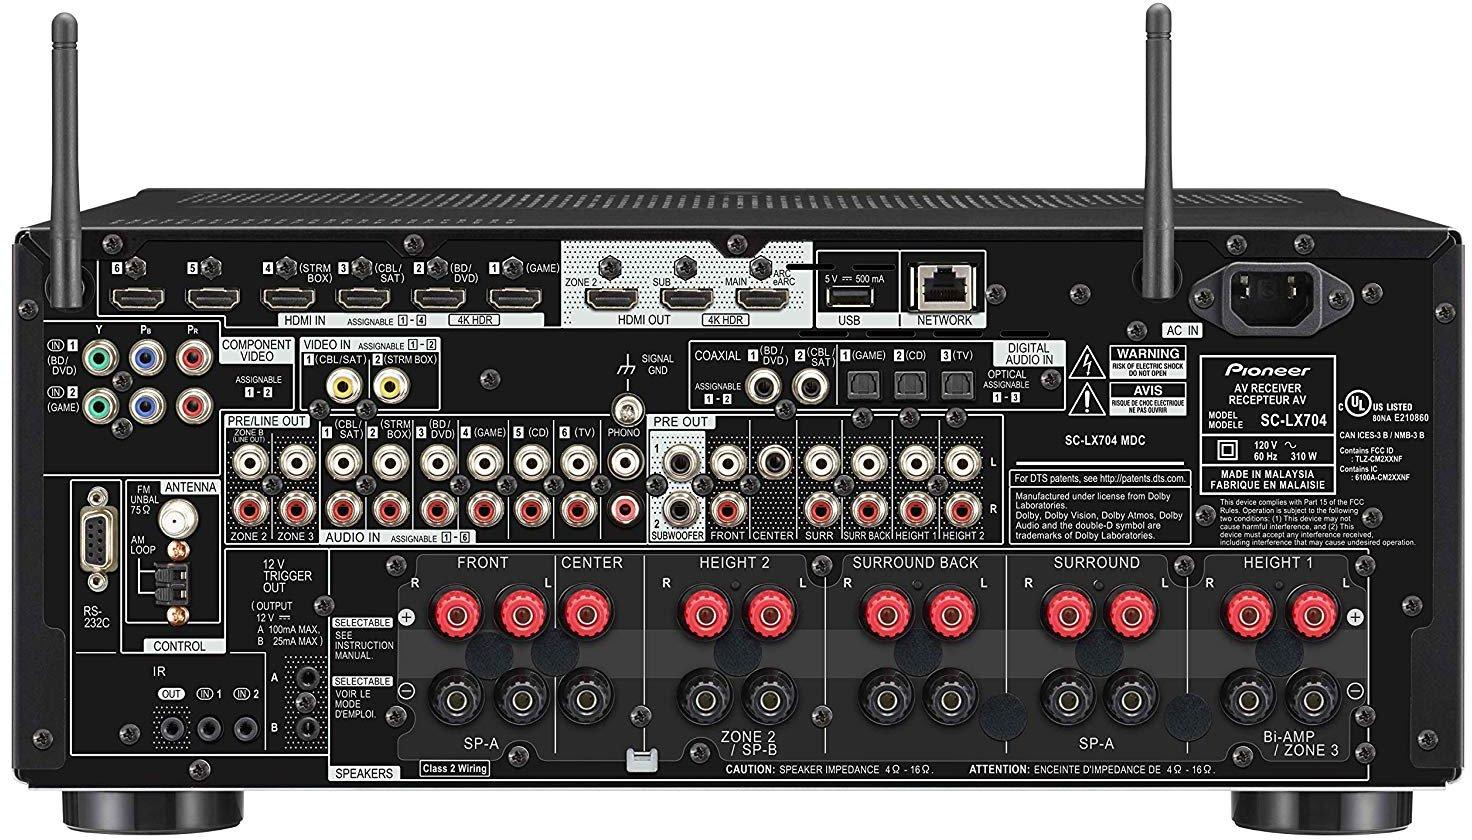 Pioneer Elite Sc-Lx704 9.2-Ch Av Receiver - Rear View